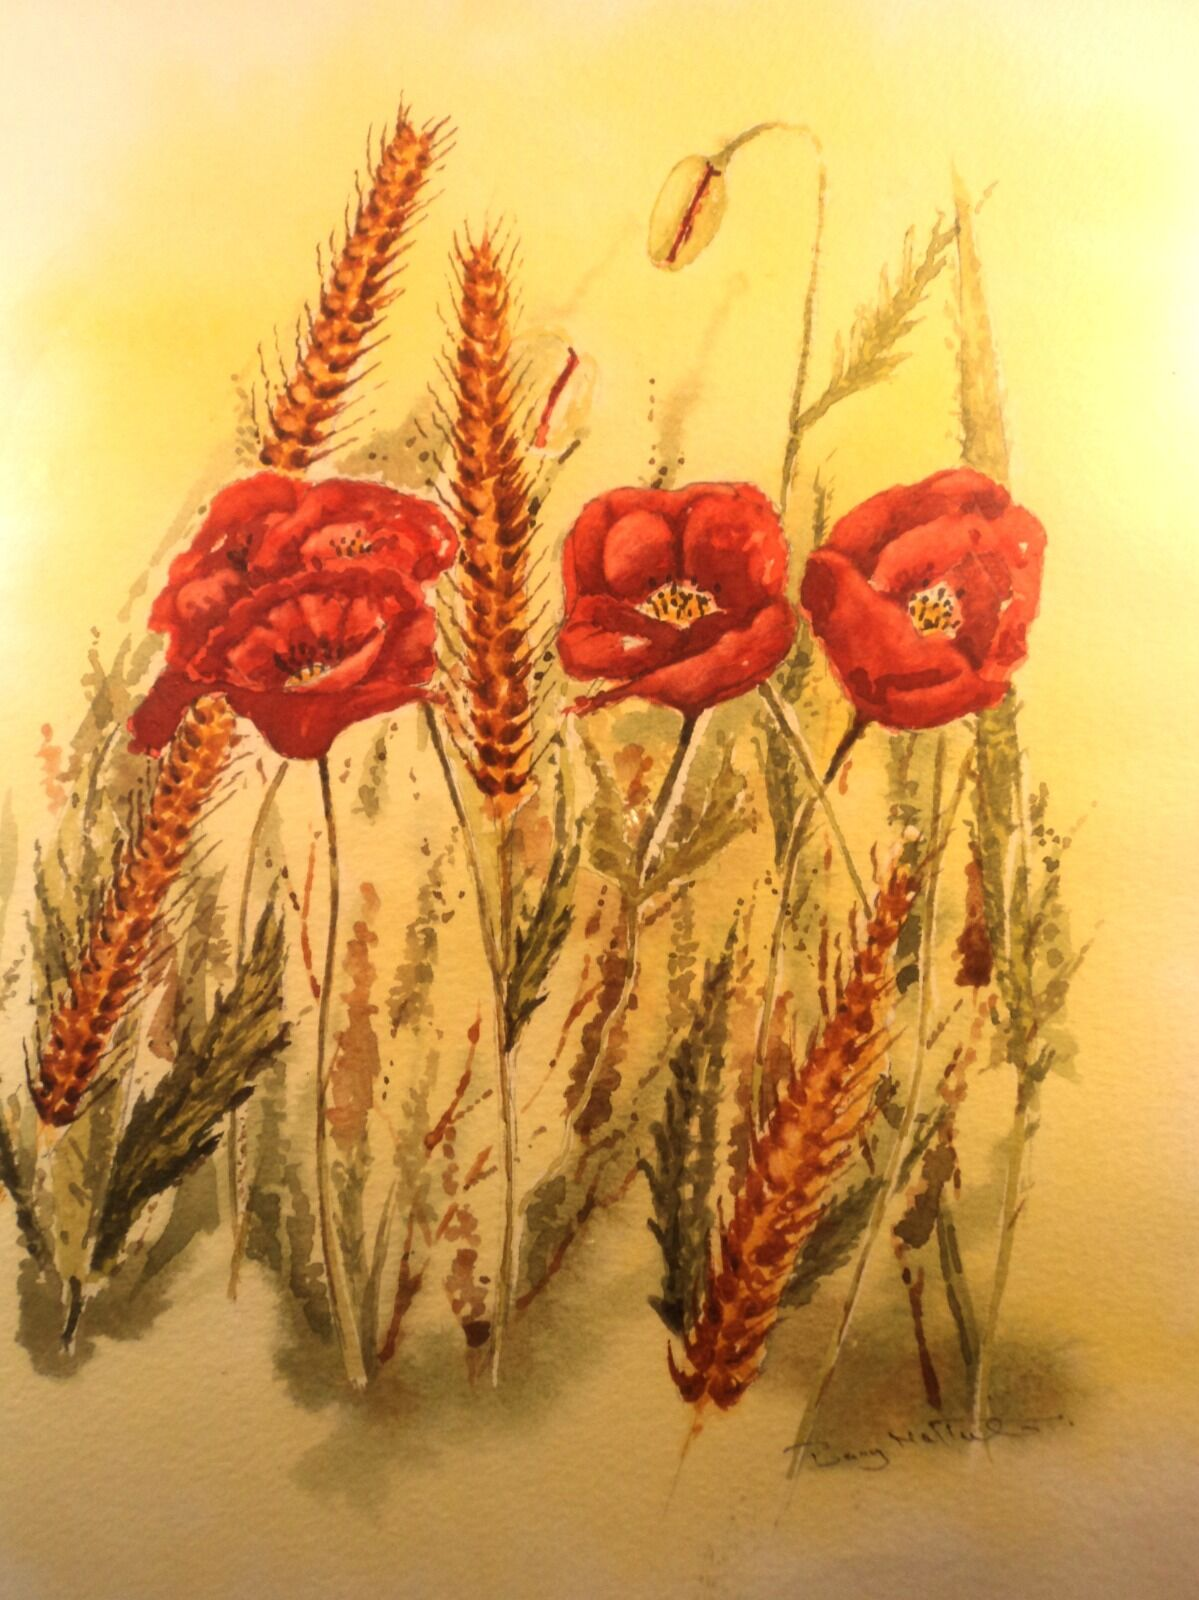 Poppies on a corn field